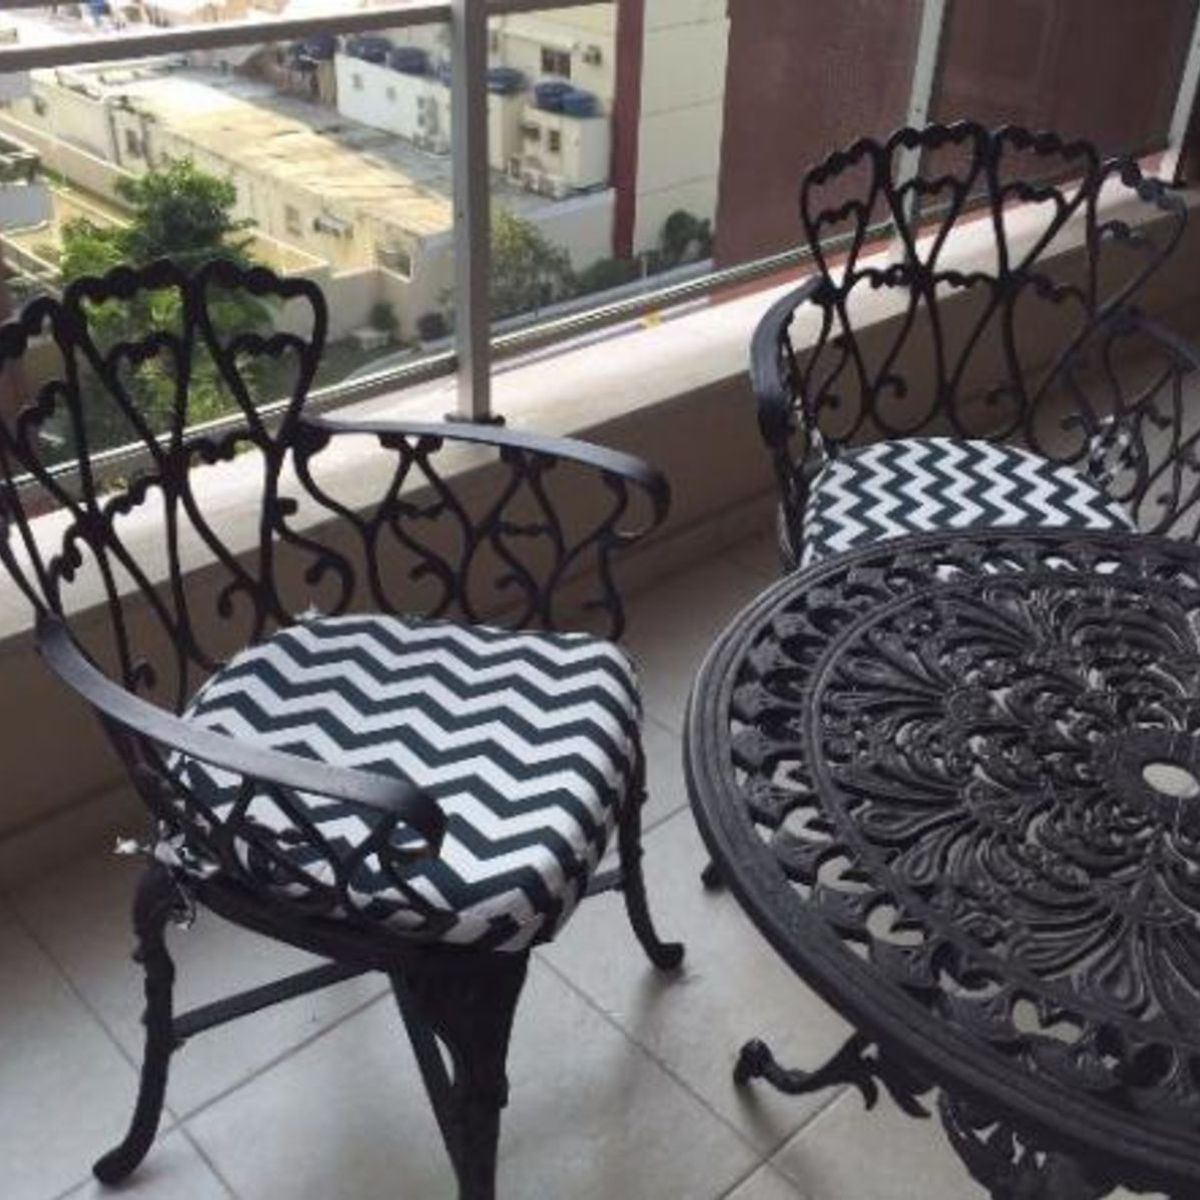 Mesa E Cadeiras De Aluminio Fundido Recem Pintadas E Acolchoadas Mesa Usado 15933342 Enjoei